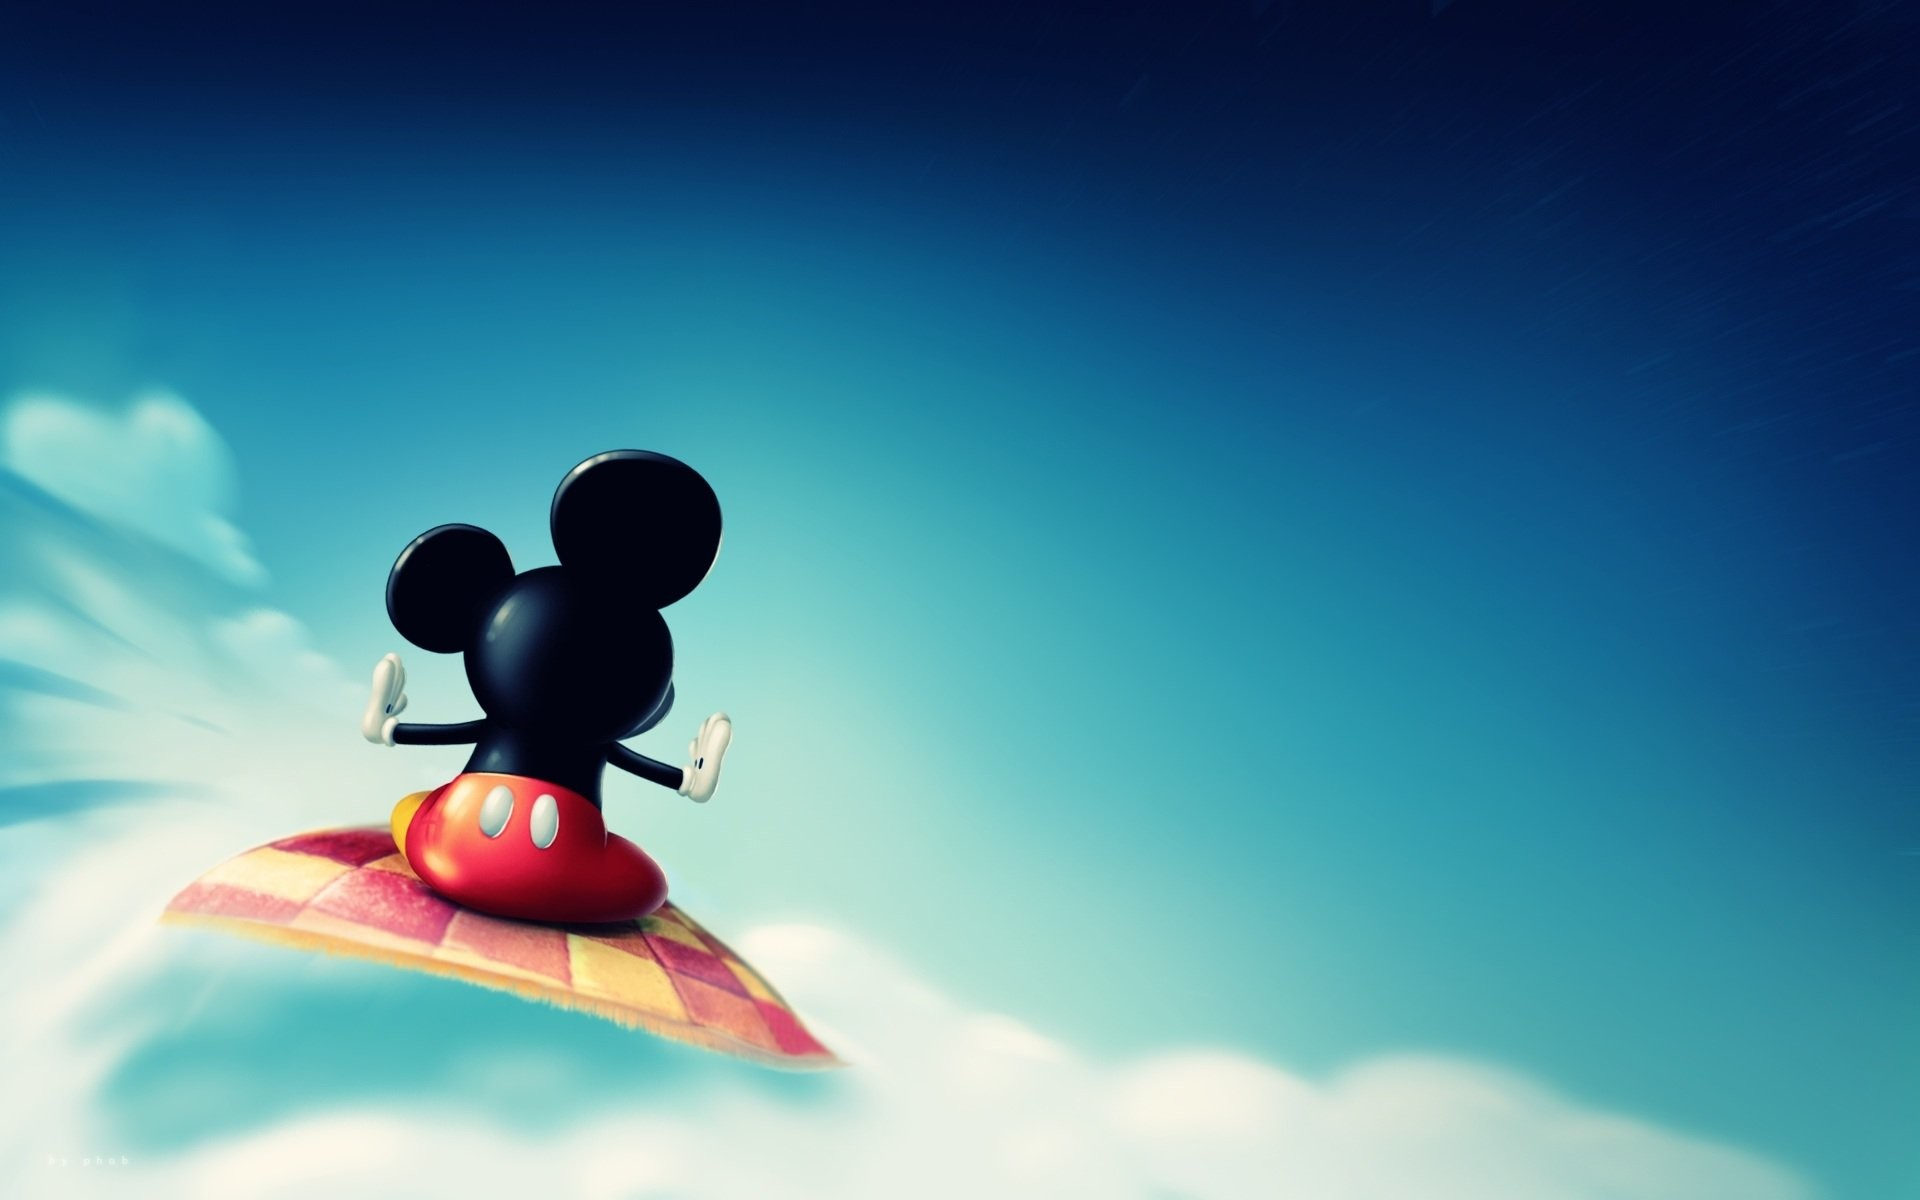 Disney HD Wallpaper (74+ Images